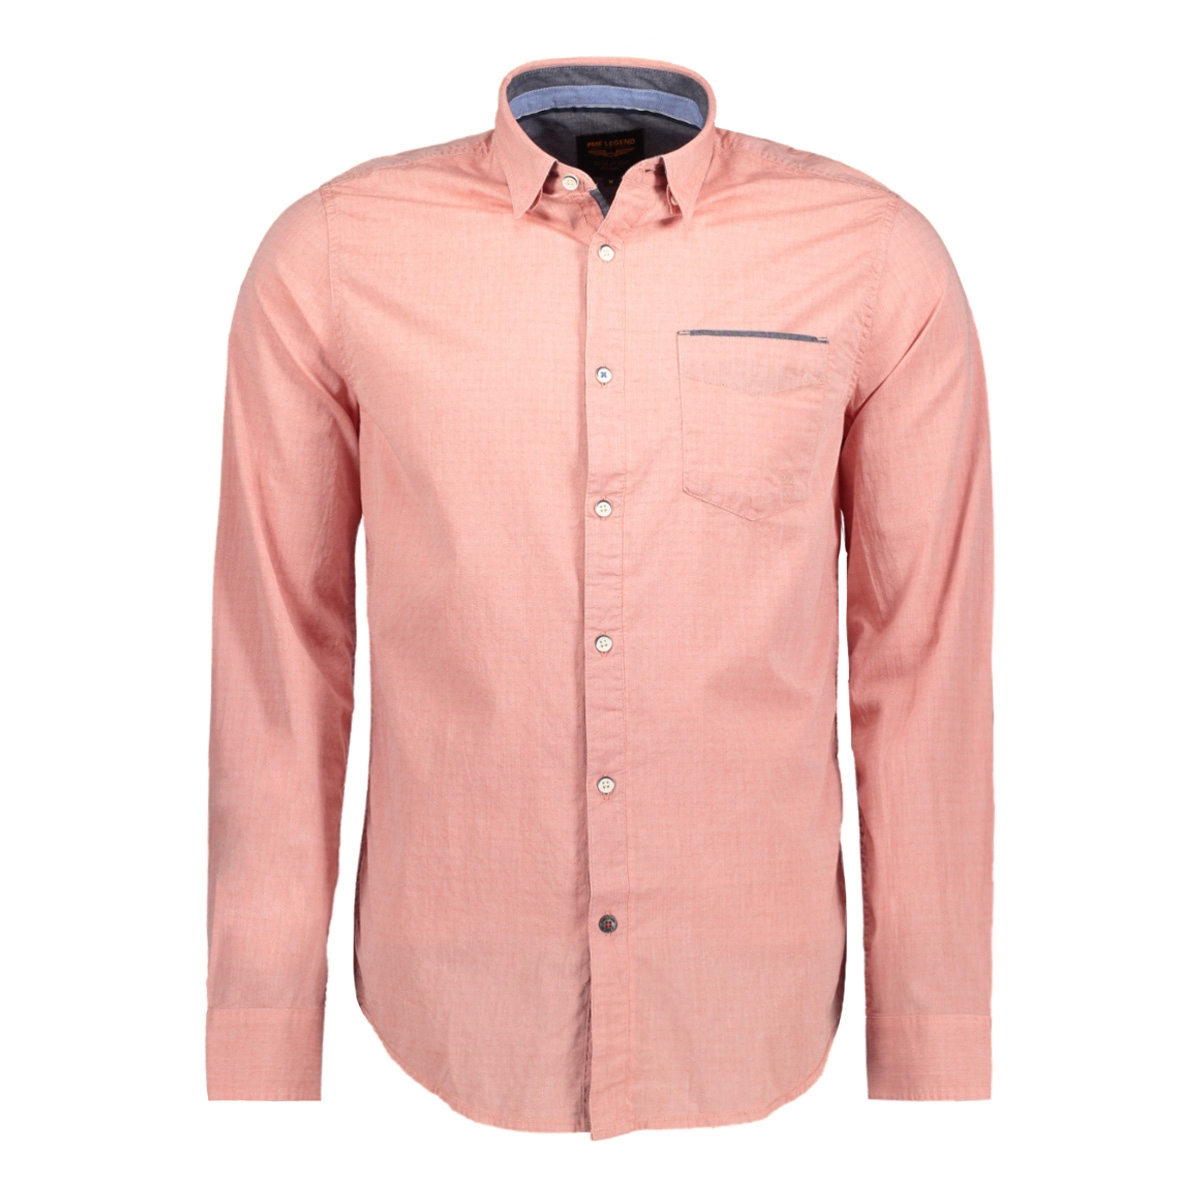 psi178211 pme legend overhemd 3260